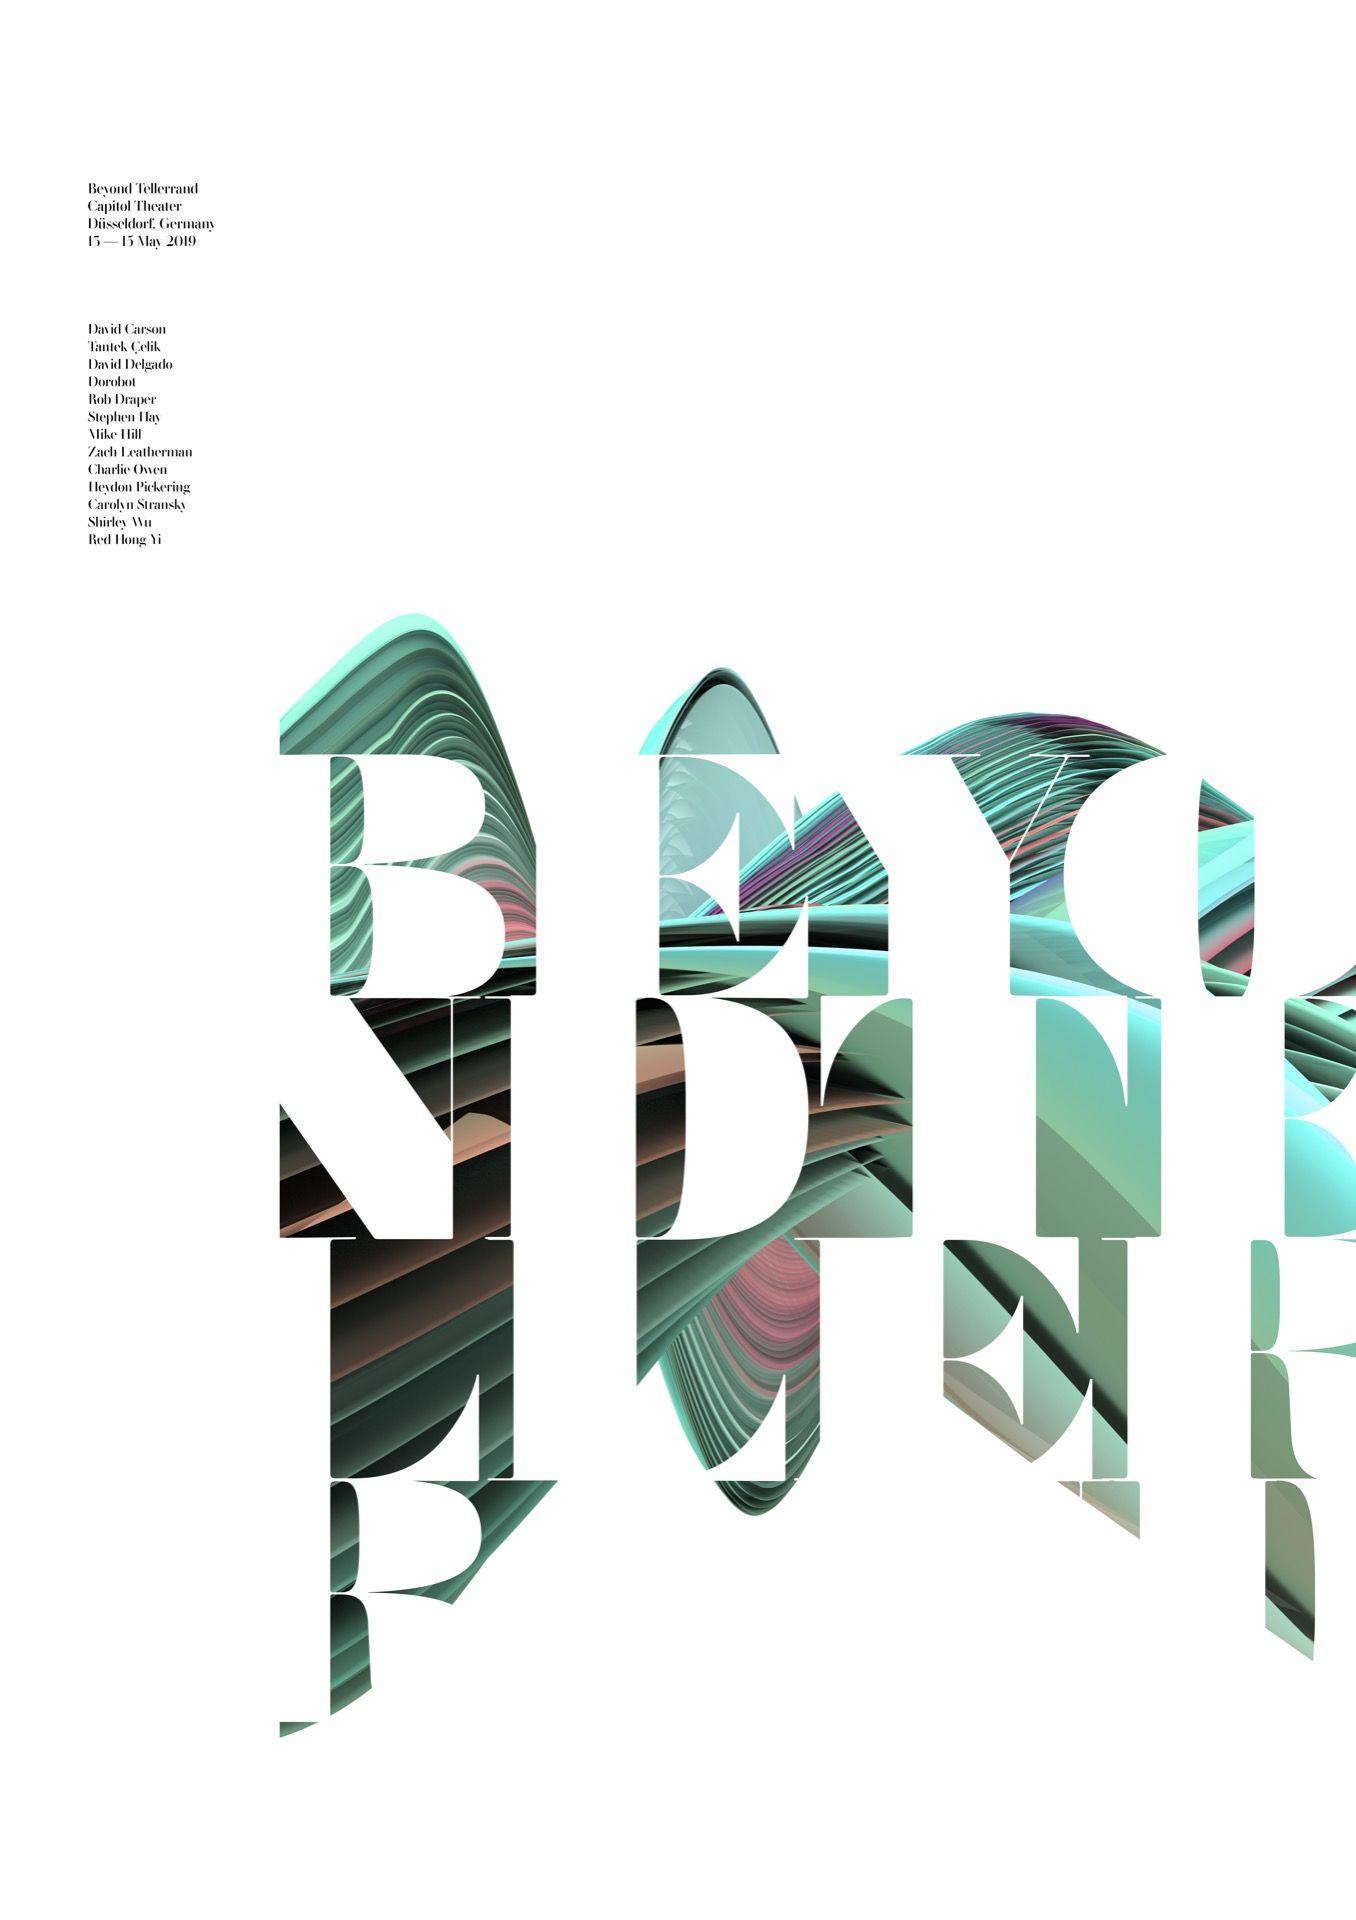 beyondtellerrand-2019-poster-bt_1_1356x1920-b5c0b92592fa750e8e797d3331e64ae2